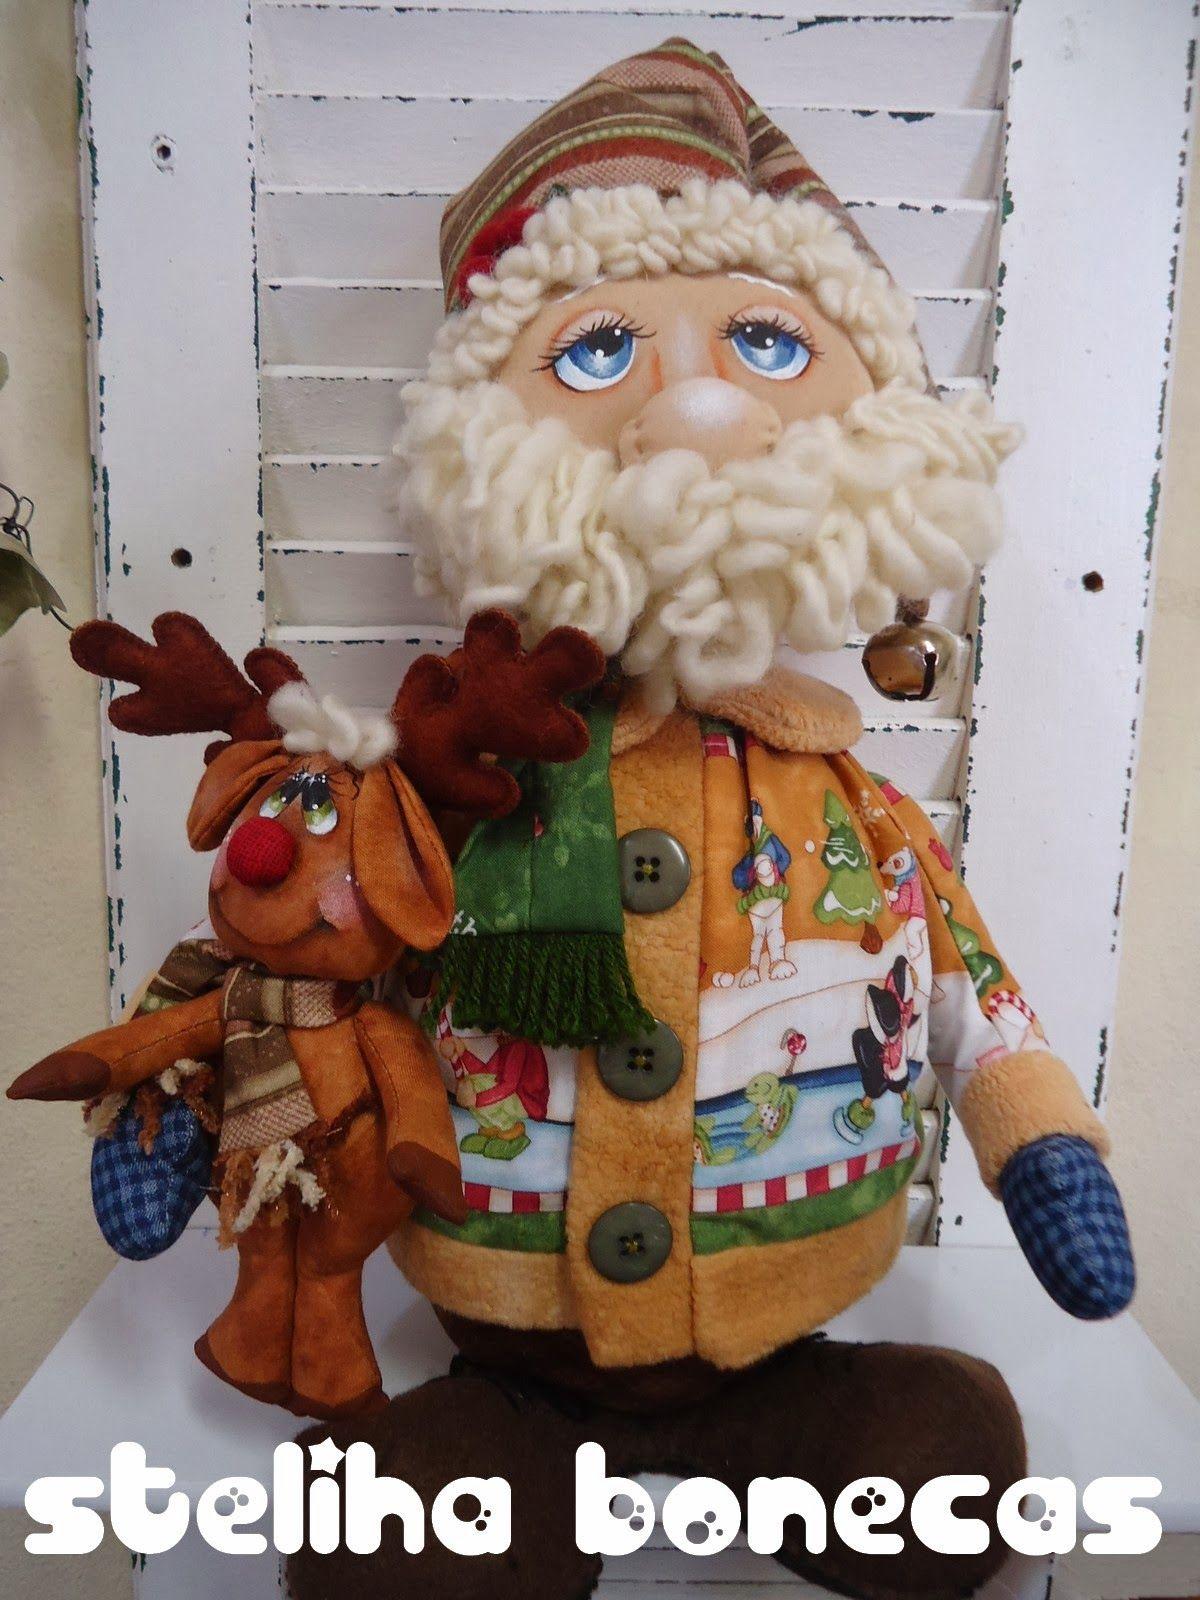 Куклы  stelinha  bonecas   .  http://stelinhabonecas.blogspot.ru/